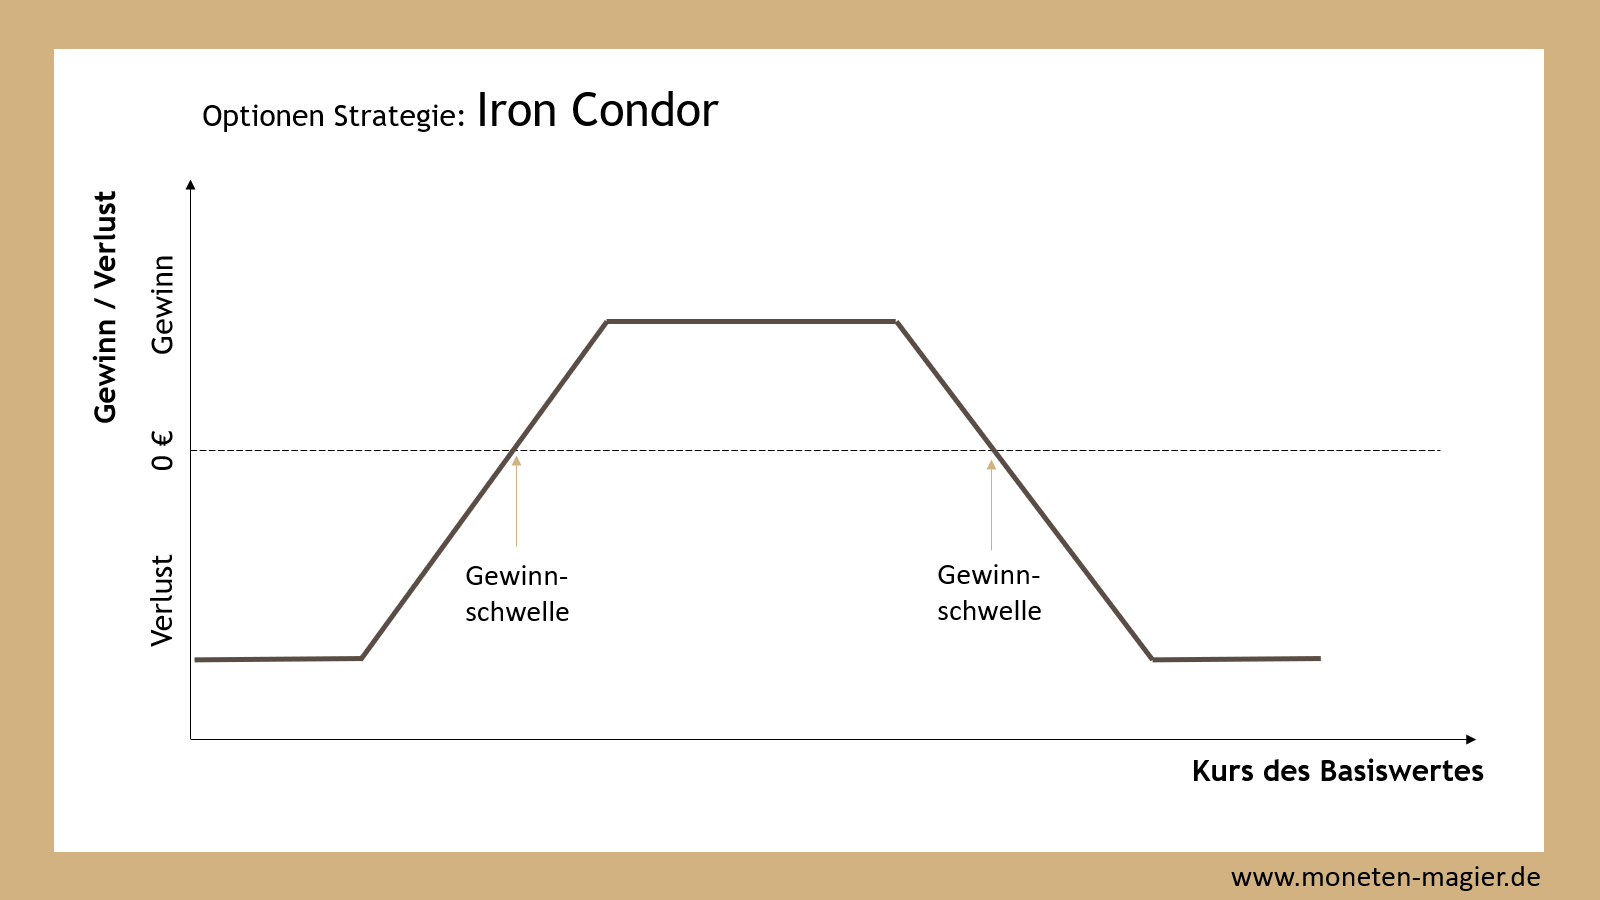 iron condor optionen strategie moneten magier